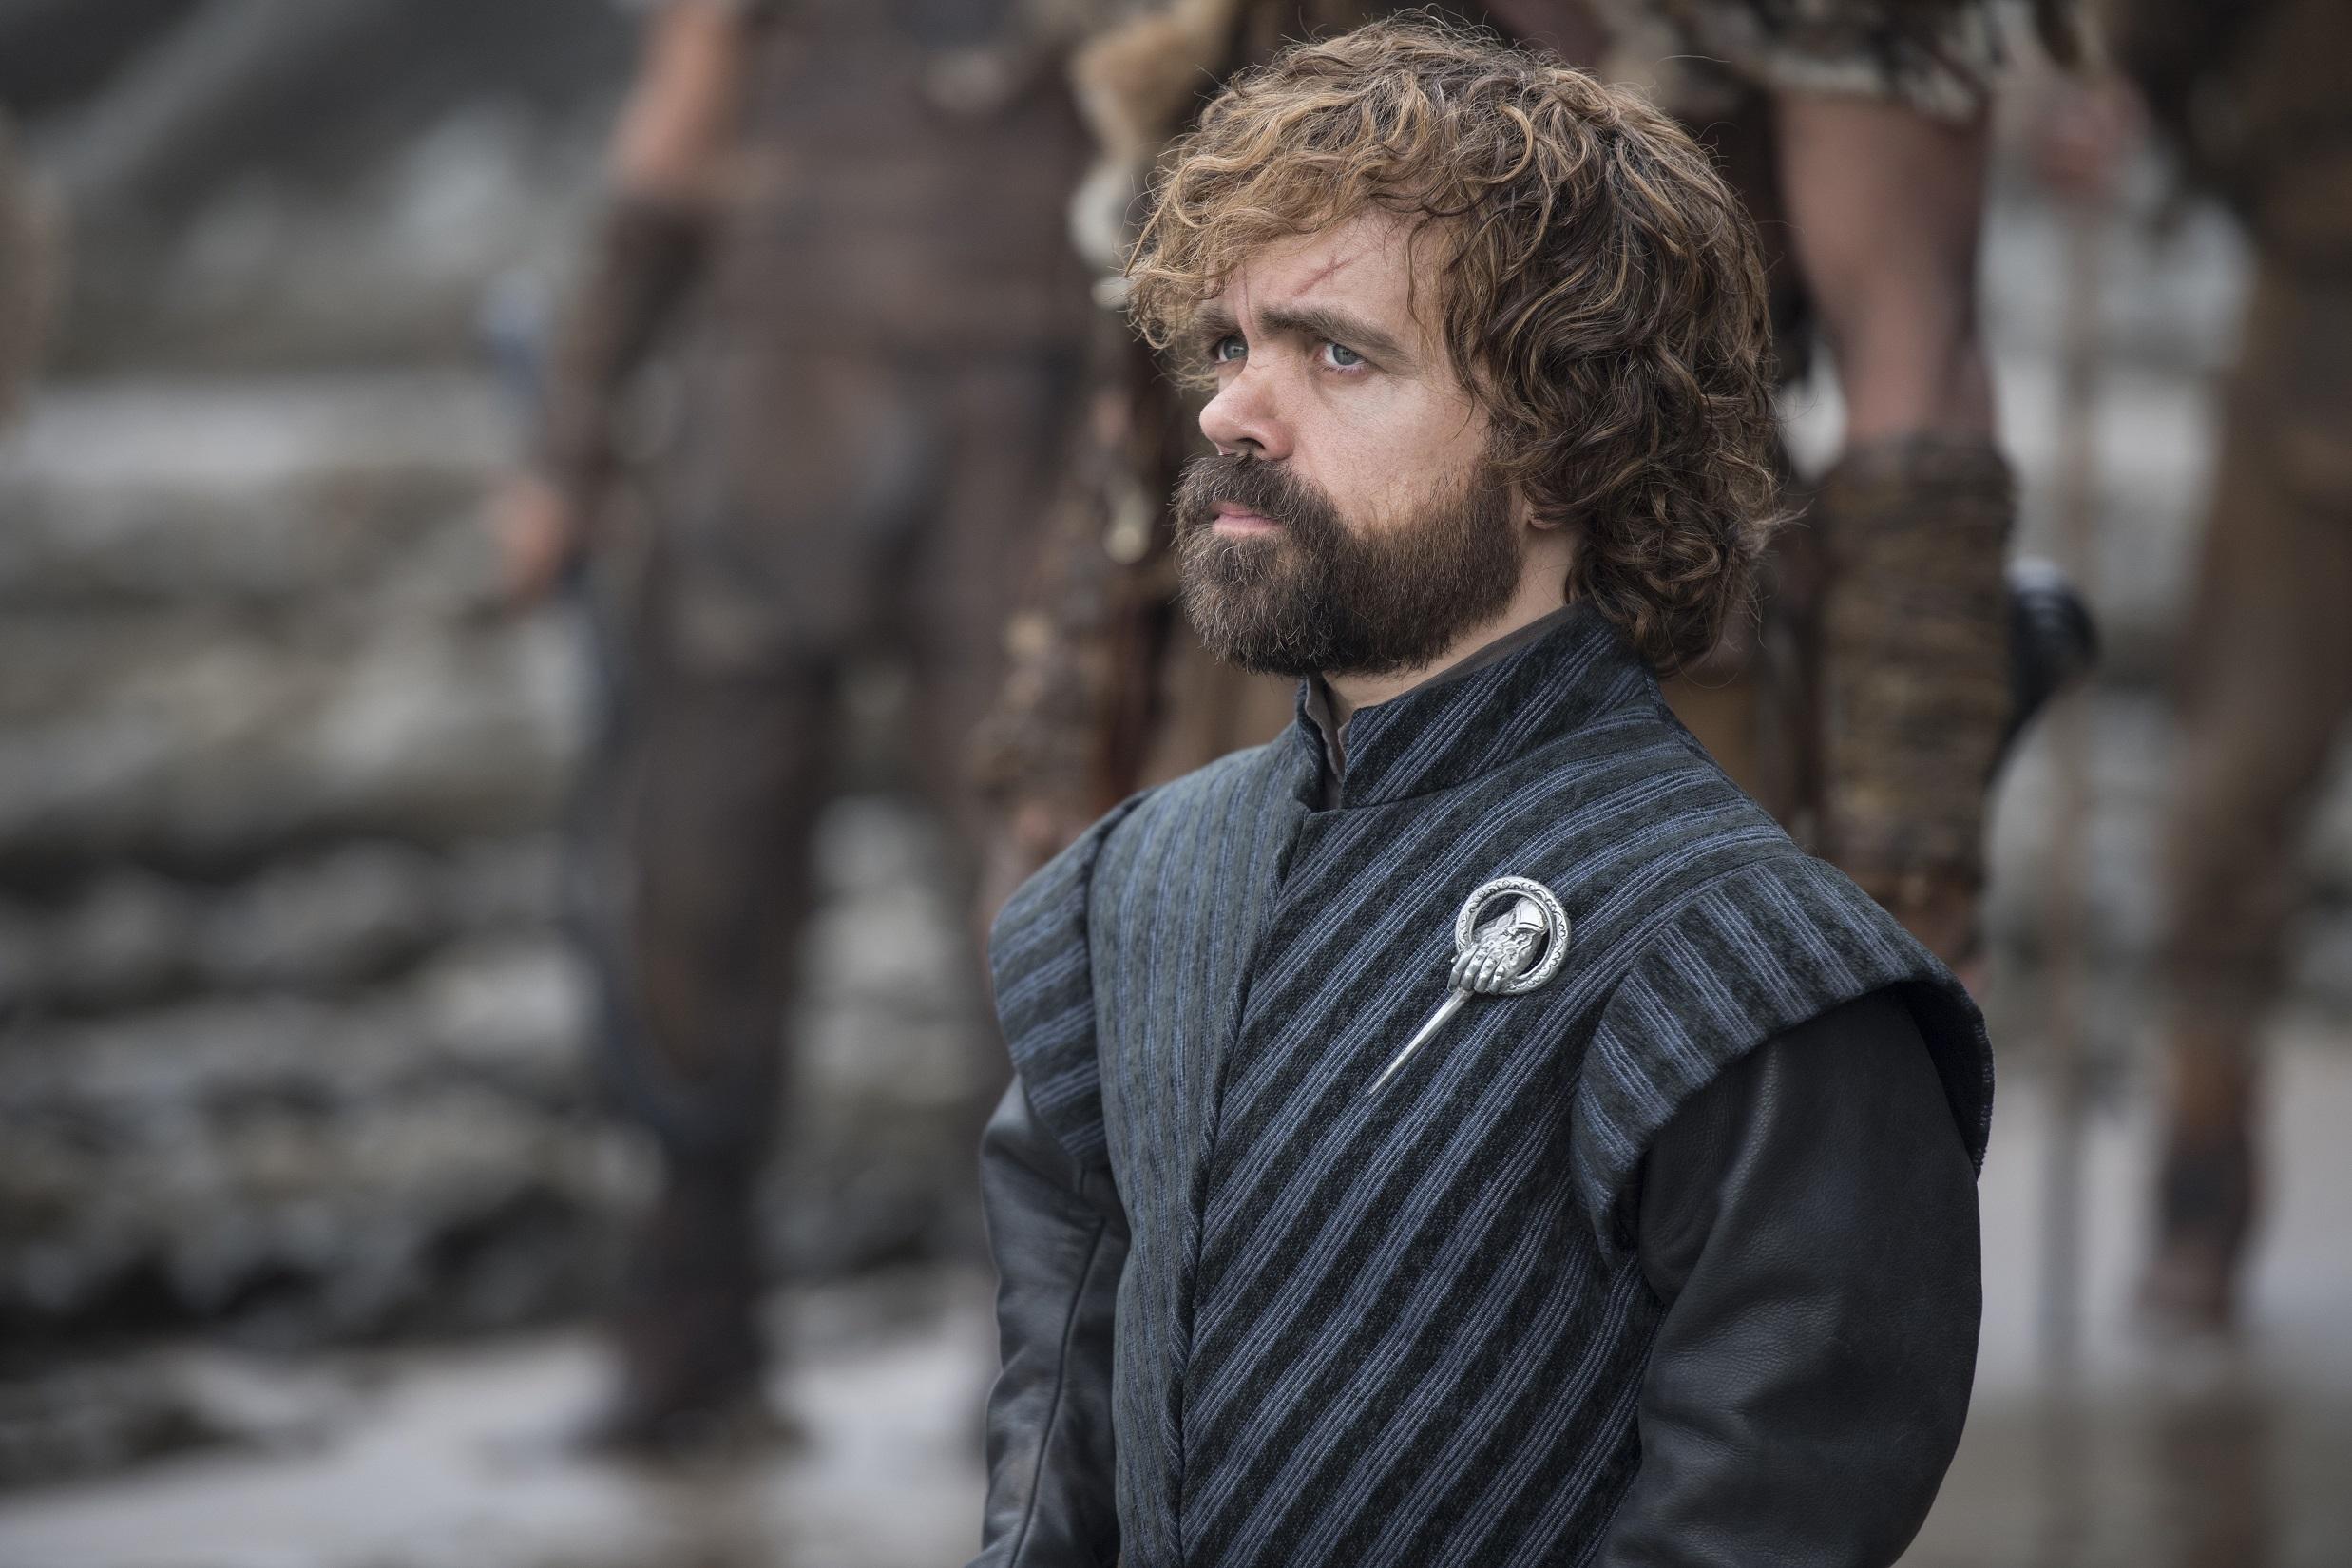 703 - Dragonstone - Tyrion 1